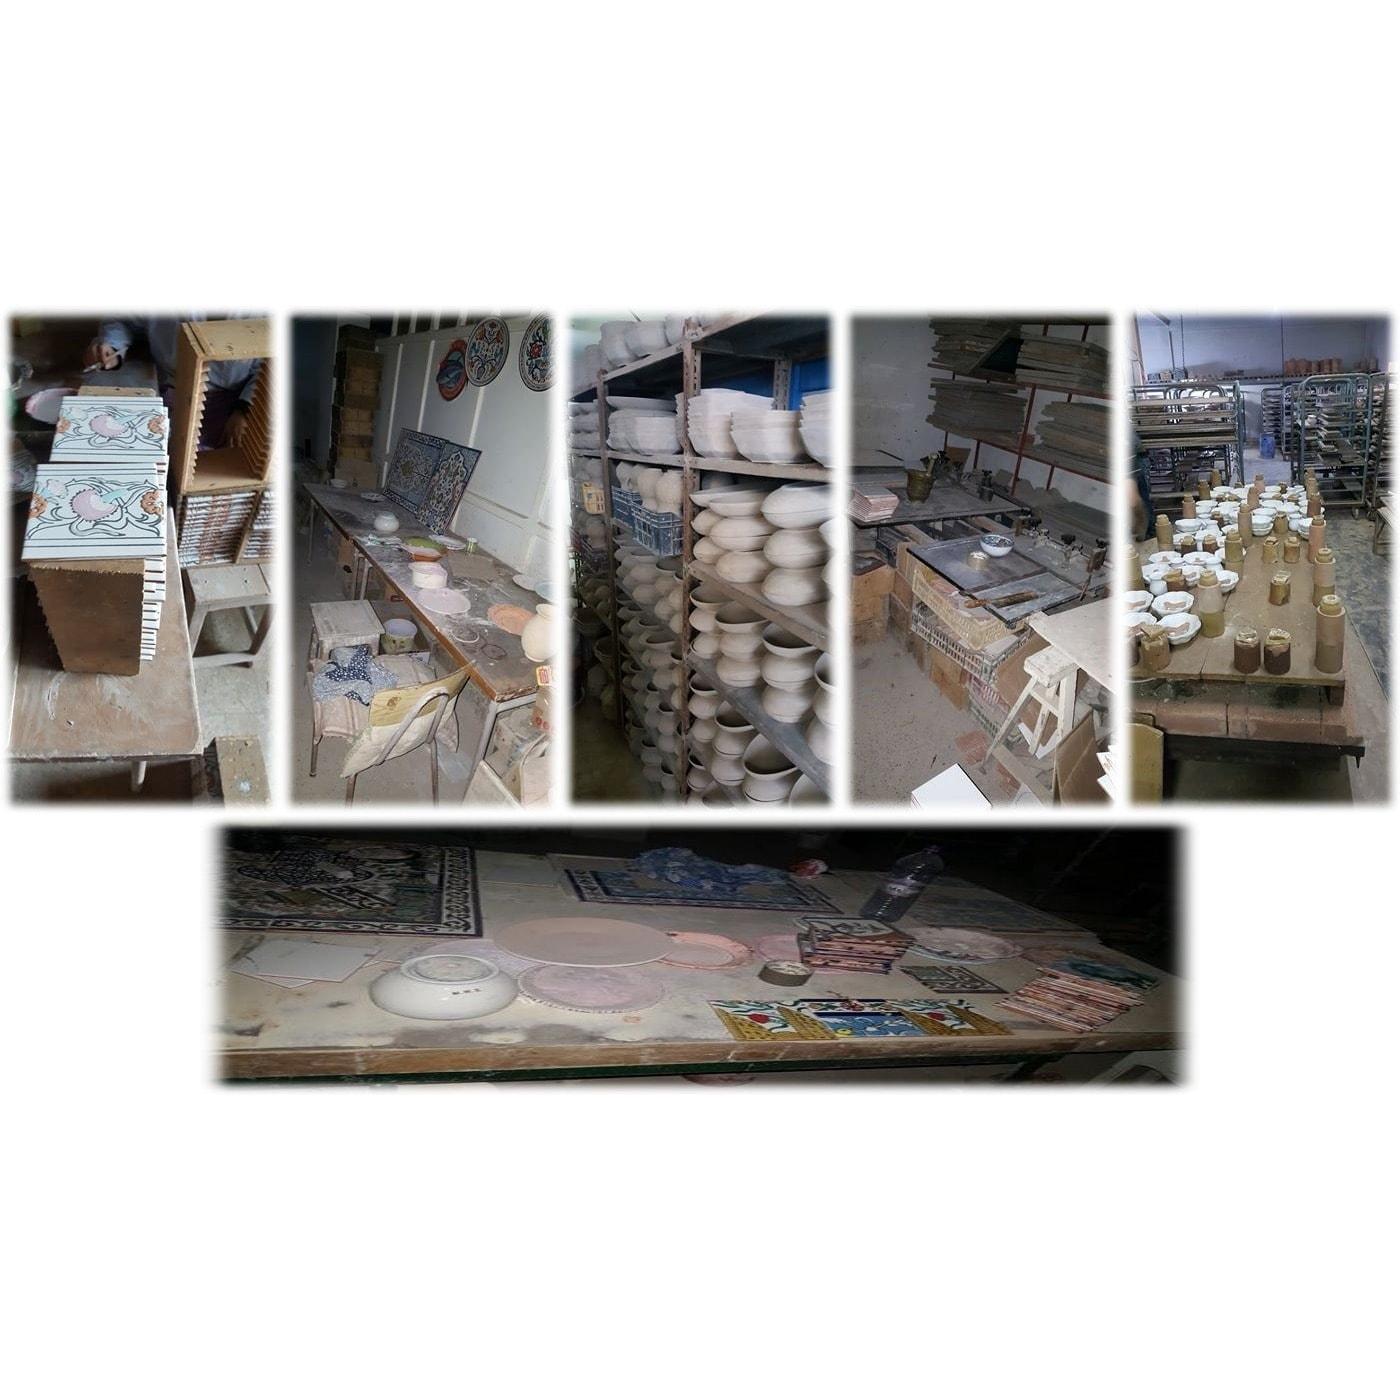 Mosaic kitchen backsplash wall art 9 ceramic tile mural free mosaic kitchen backsplash wall art 9 ceramic tile mural free shipping today overstock 11882134 dailygadgetfo Gallery